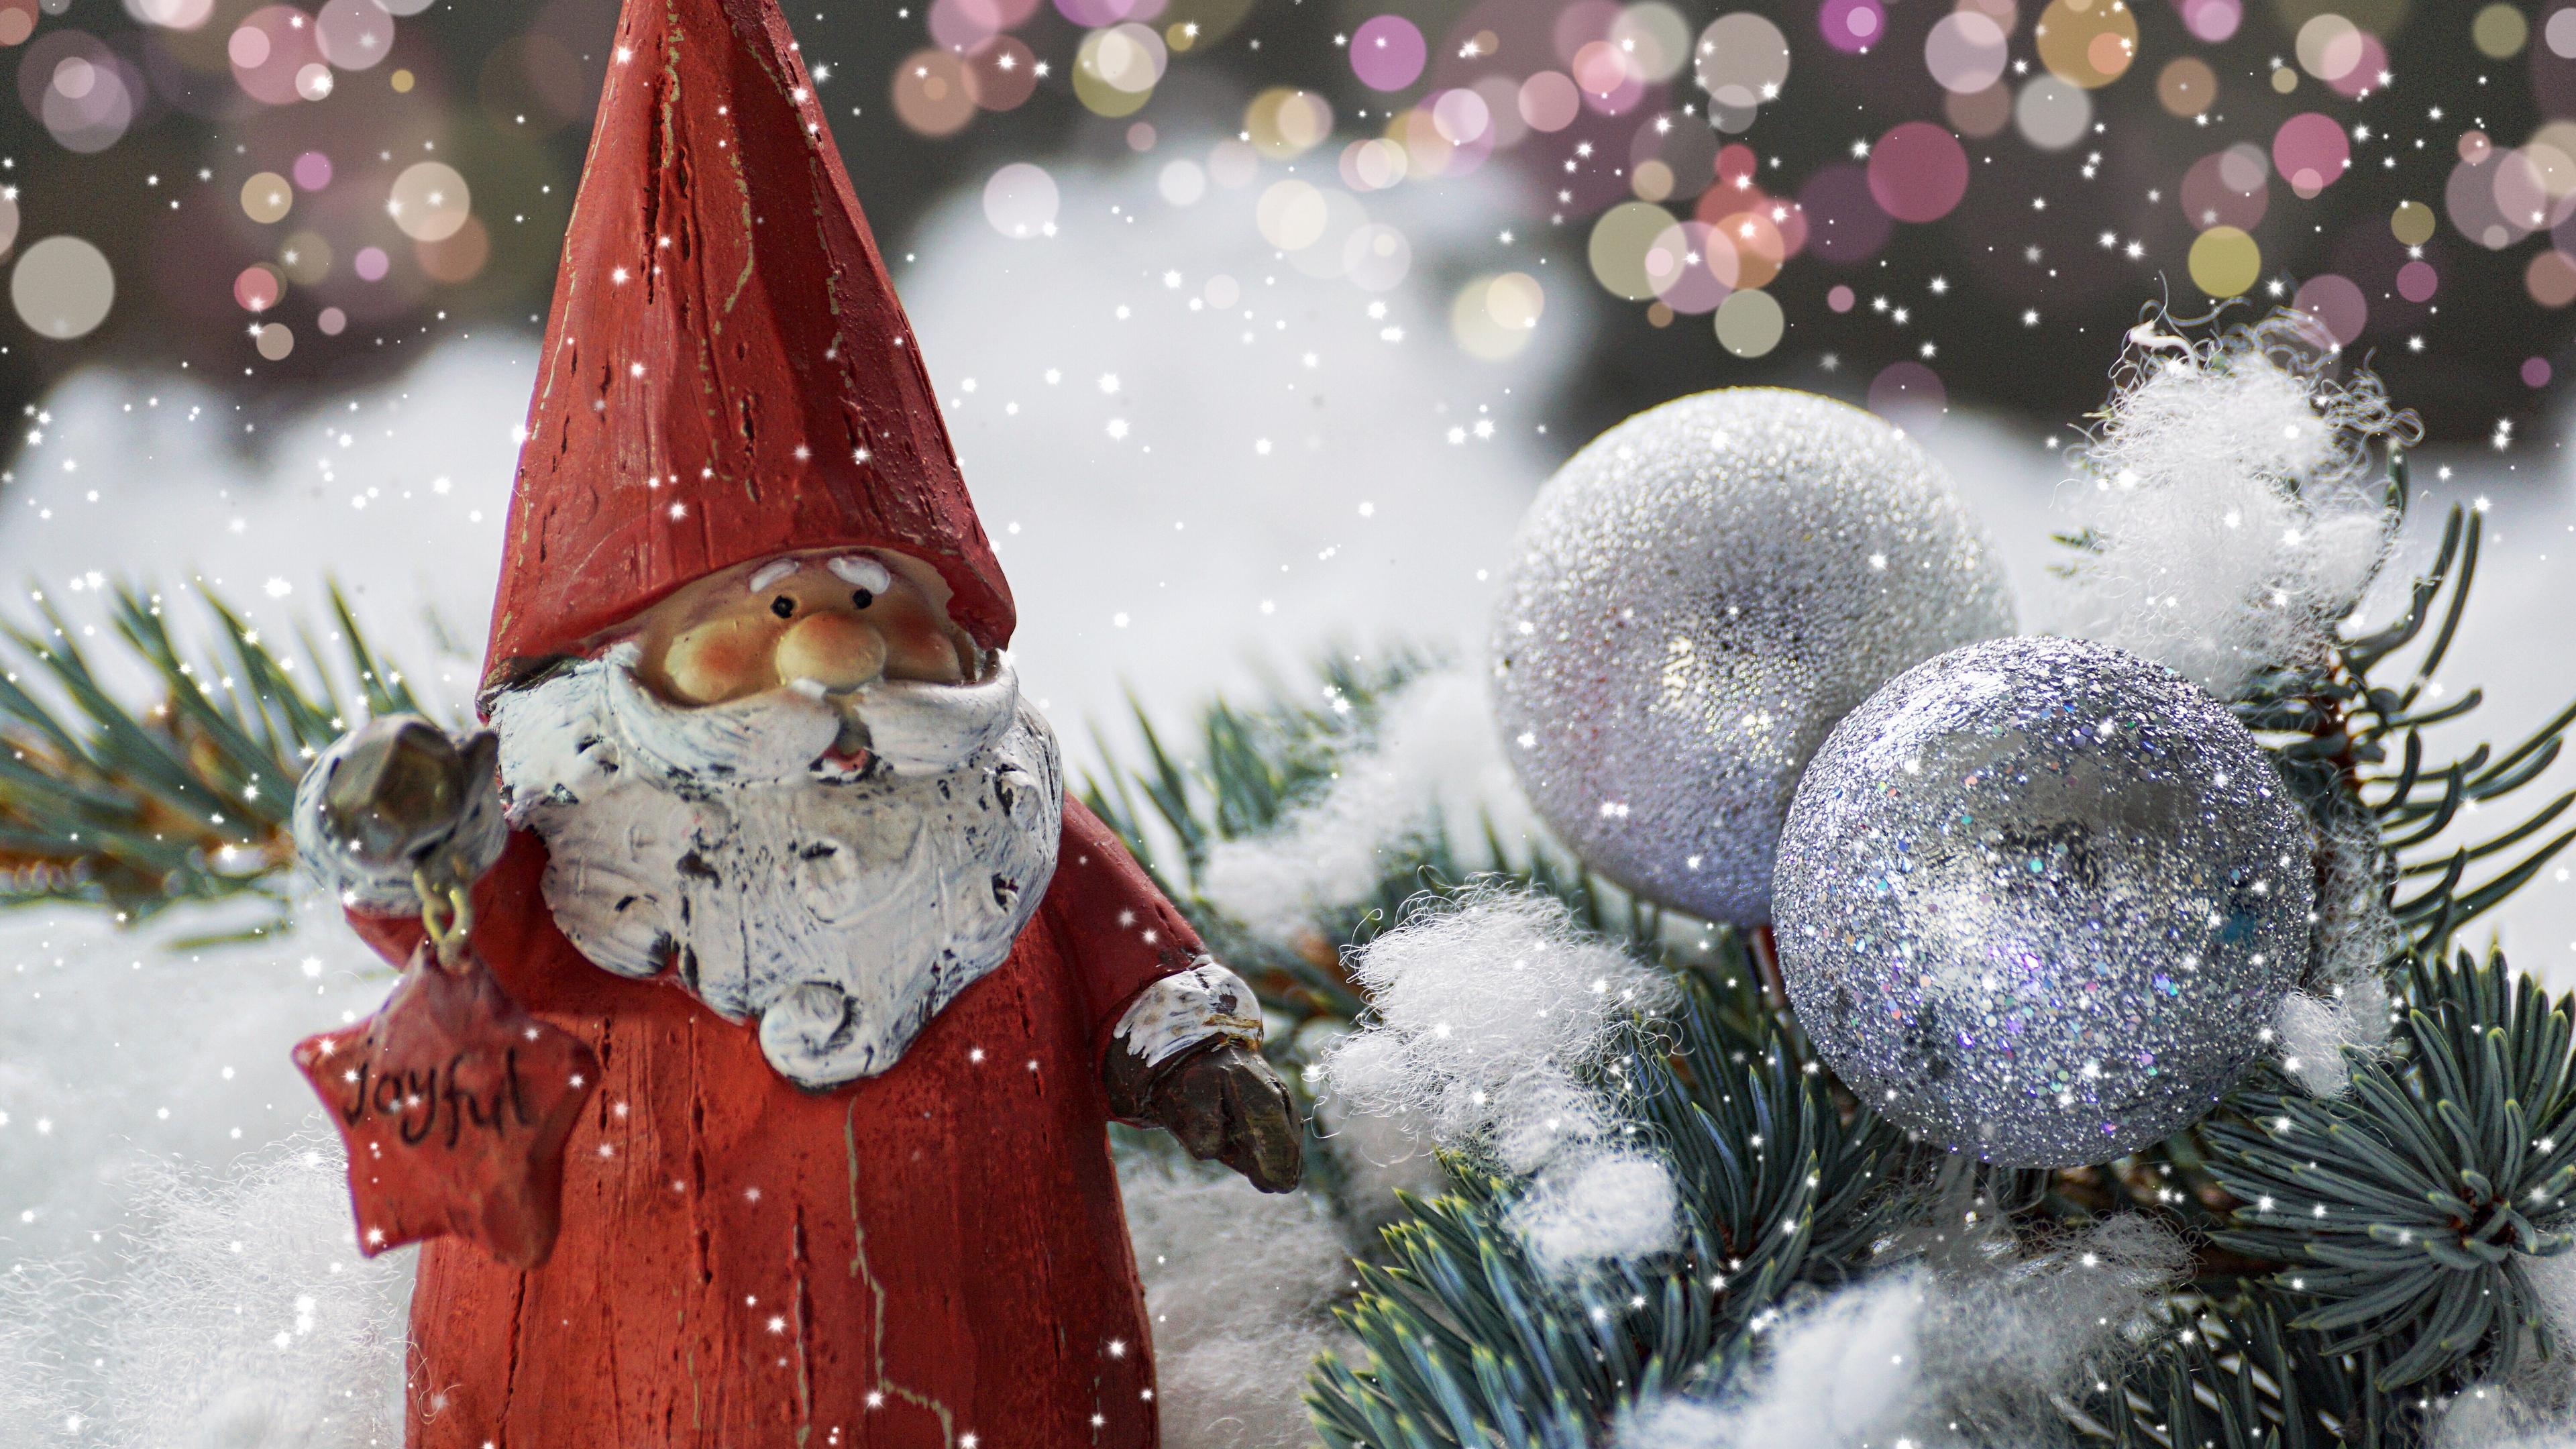 santa claus new year figurine 4k 1538345121 - santa claus, new year, figurine 4k - santa claus, new year, figurine